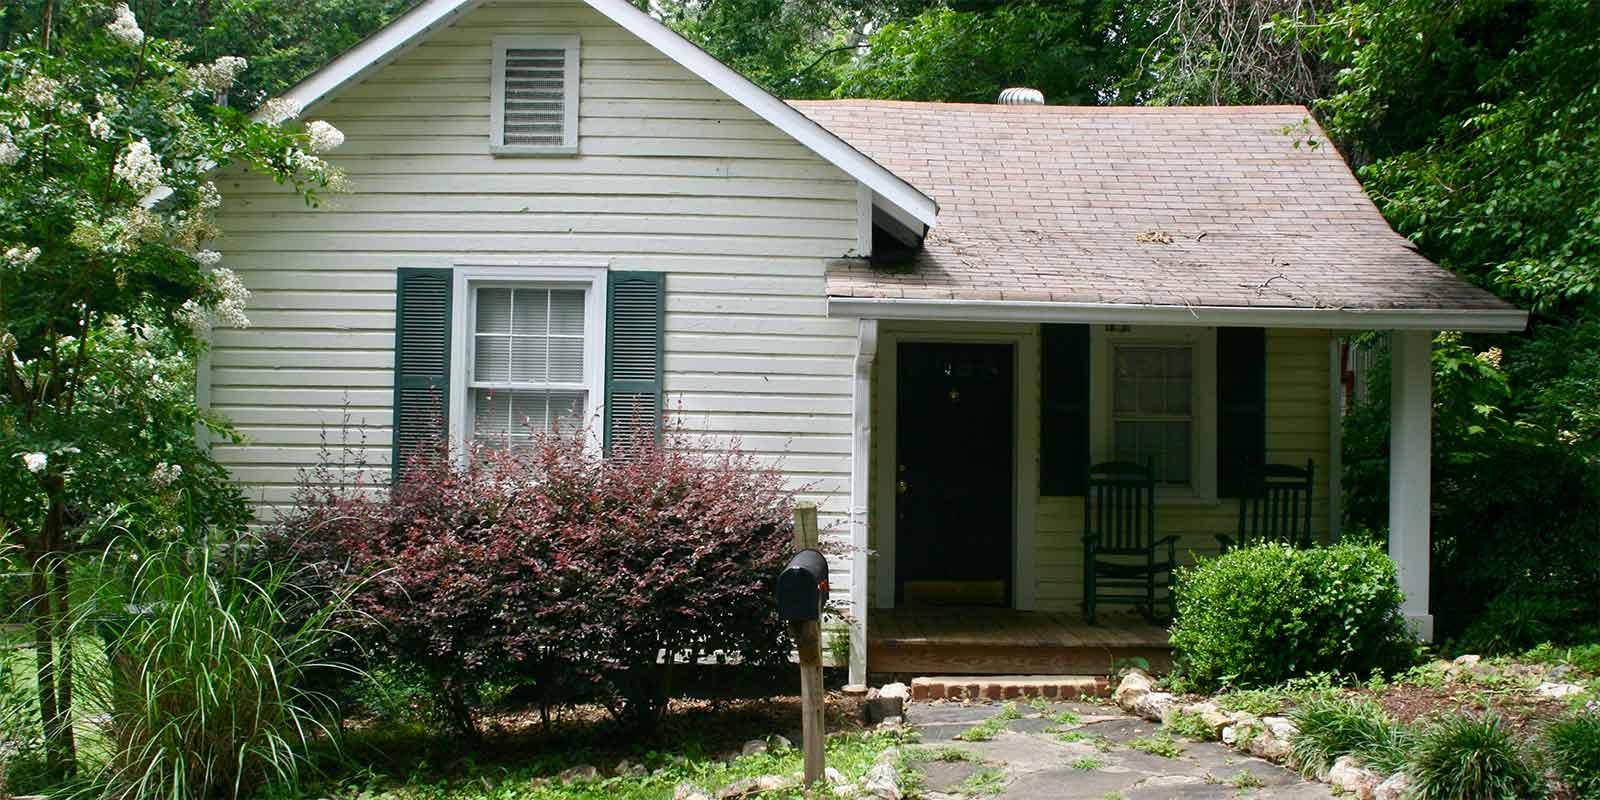 425 E 10th Street, Rome, Georgia 30161, 2 Bedrooms Bedrooms, ,1 BathroomBathrooms,House,Rental,10th Street,1040